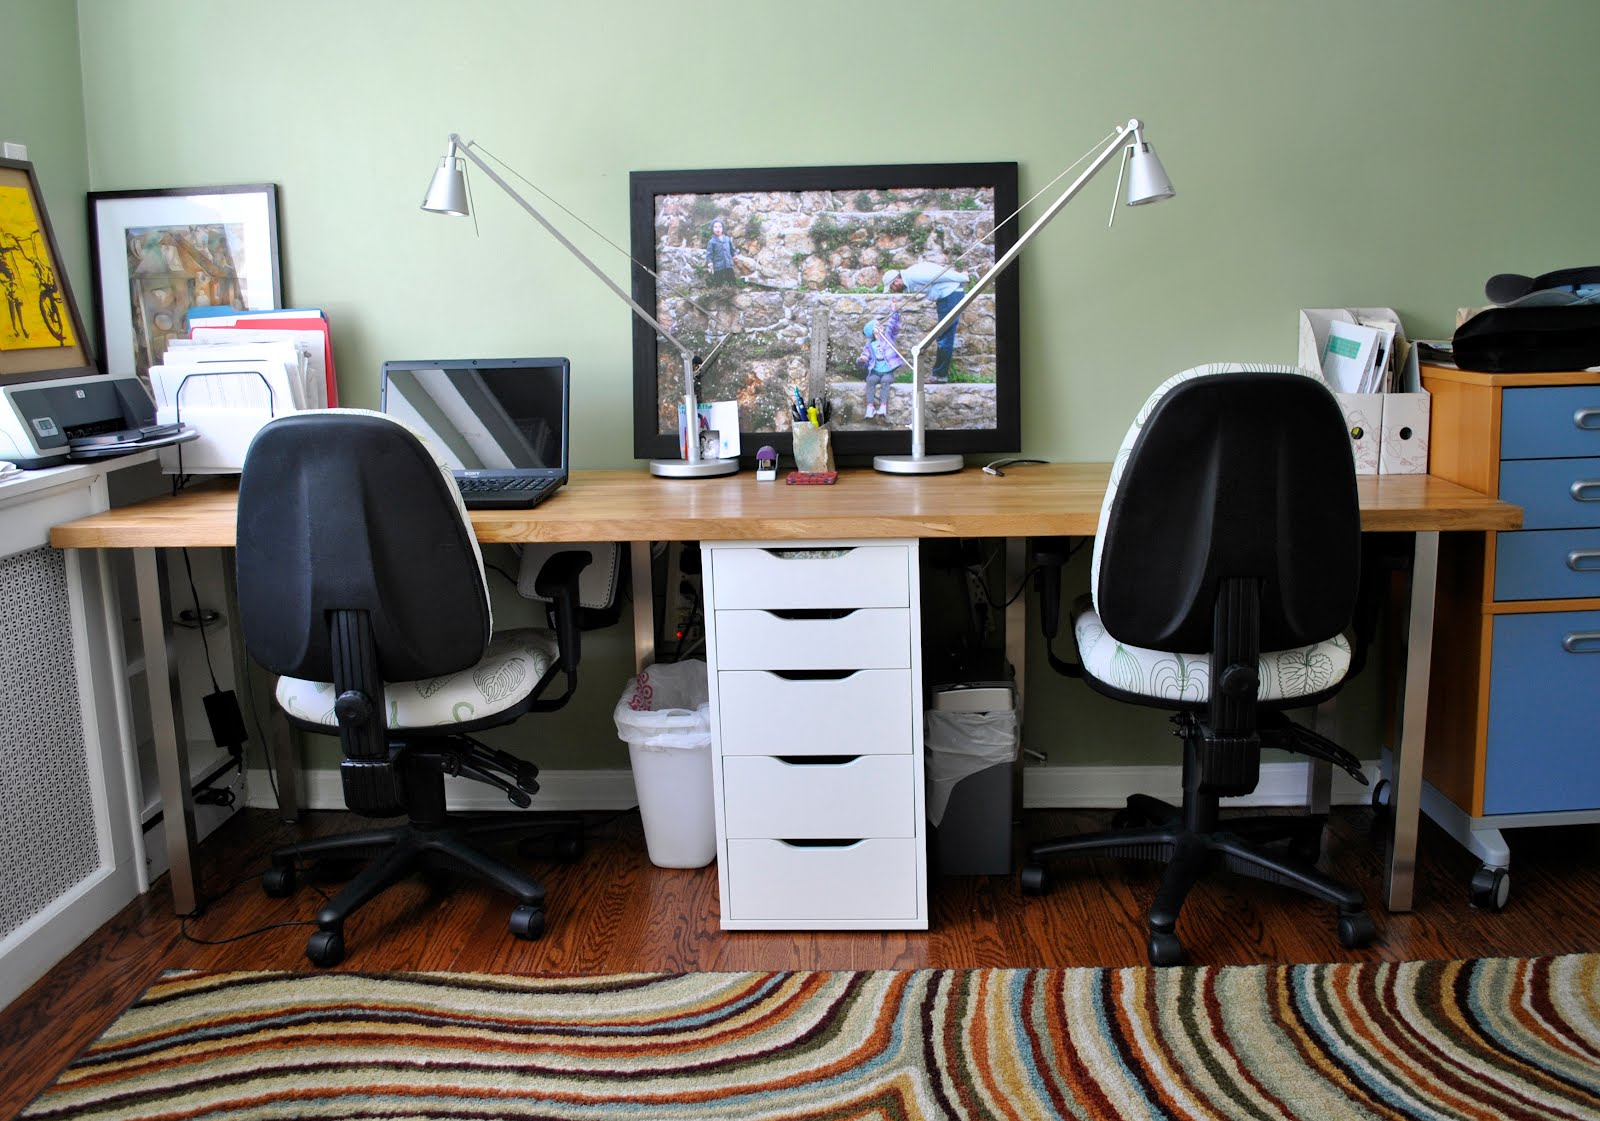 Bon IKEA Home Office Desk For 2 People